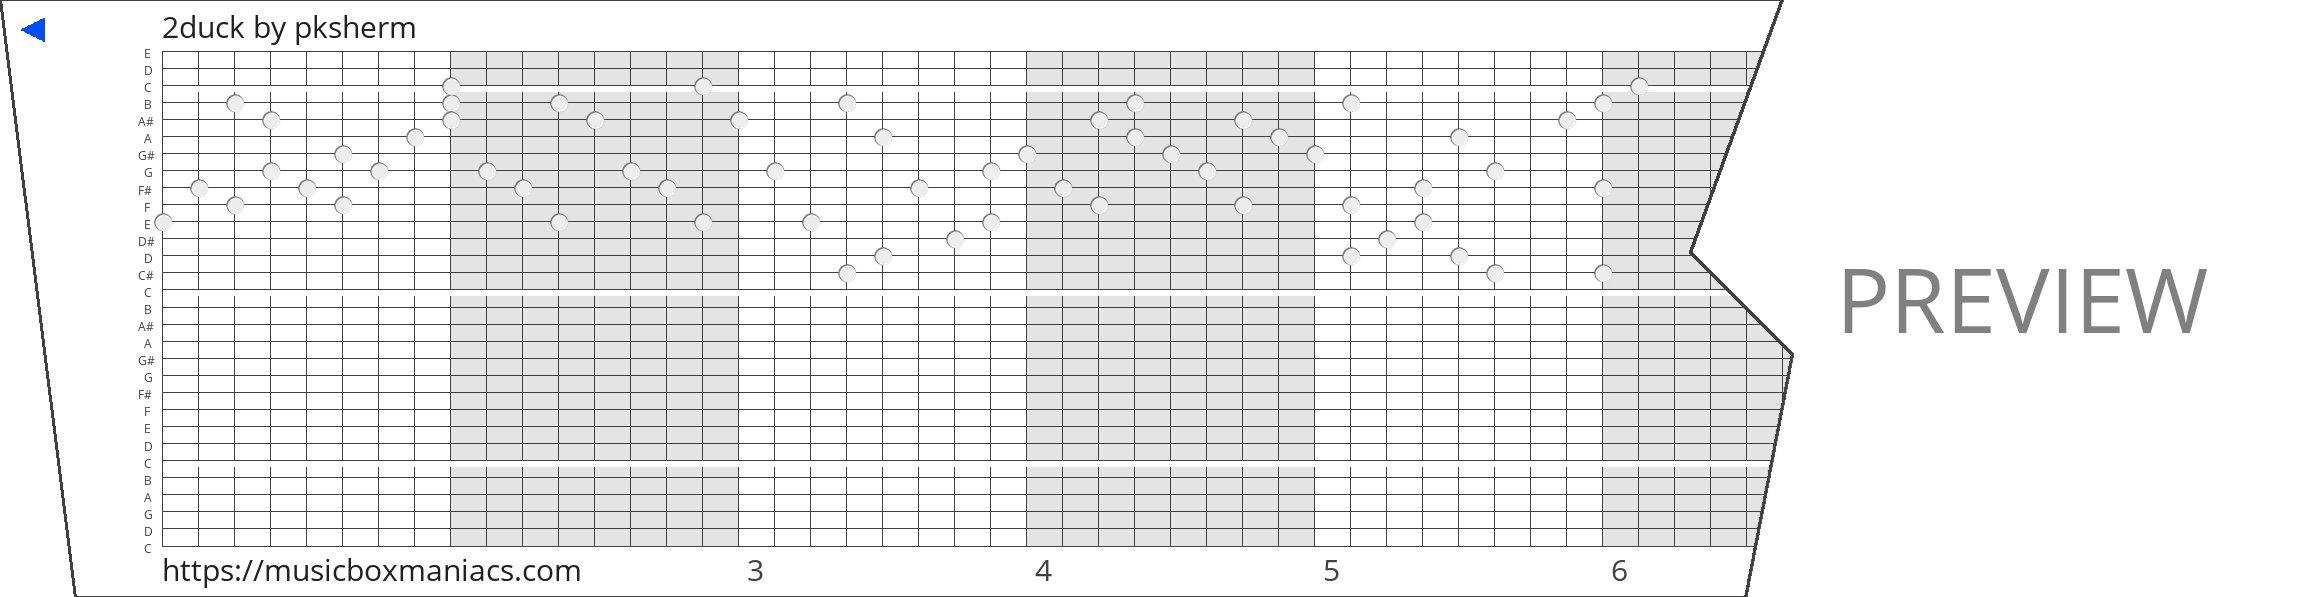 2duck 30 note music box paper strip